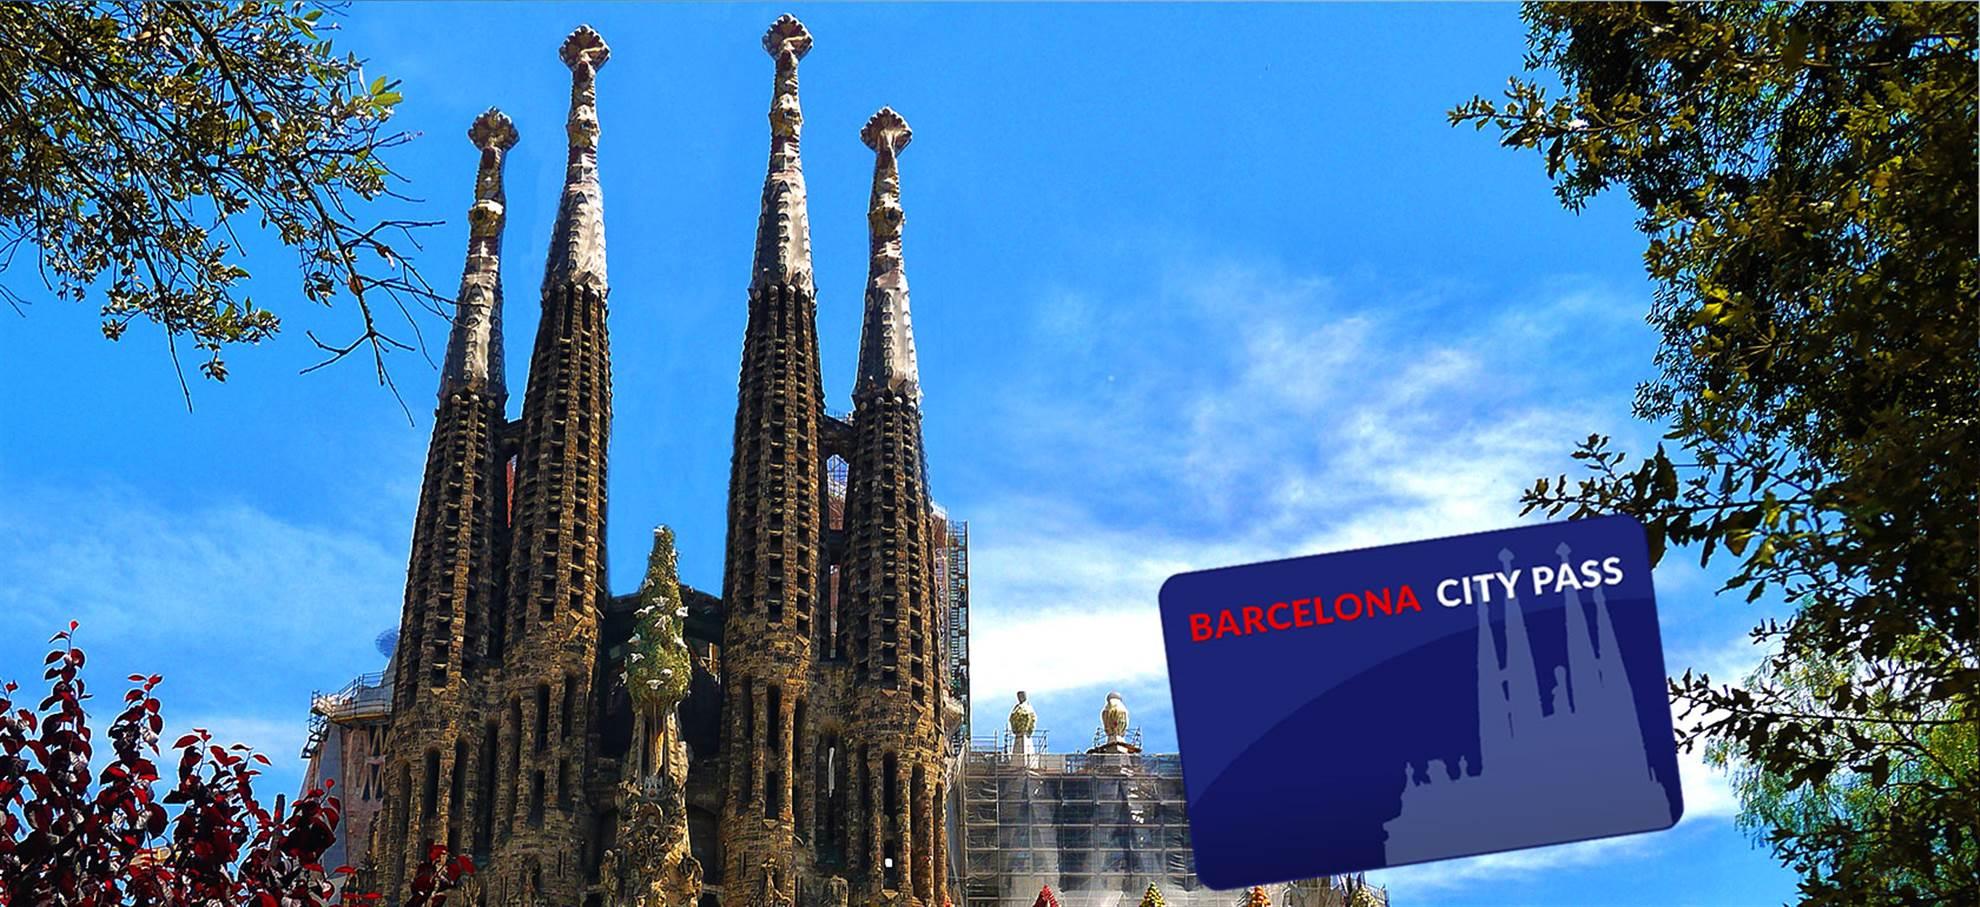 Barcelona City Pass (obejmuje Sagrada Familia i Park Güell)